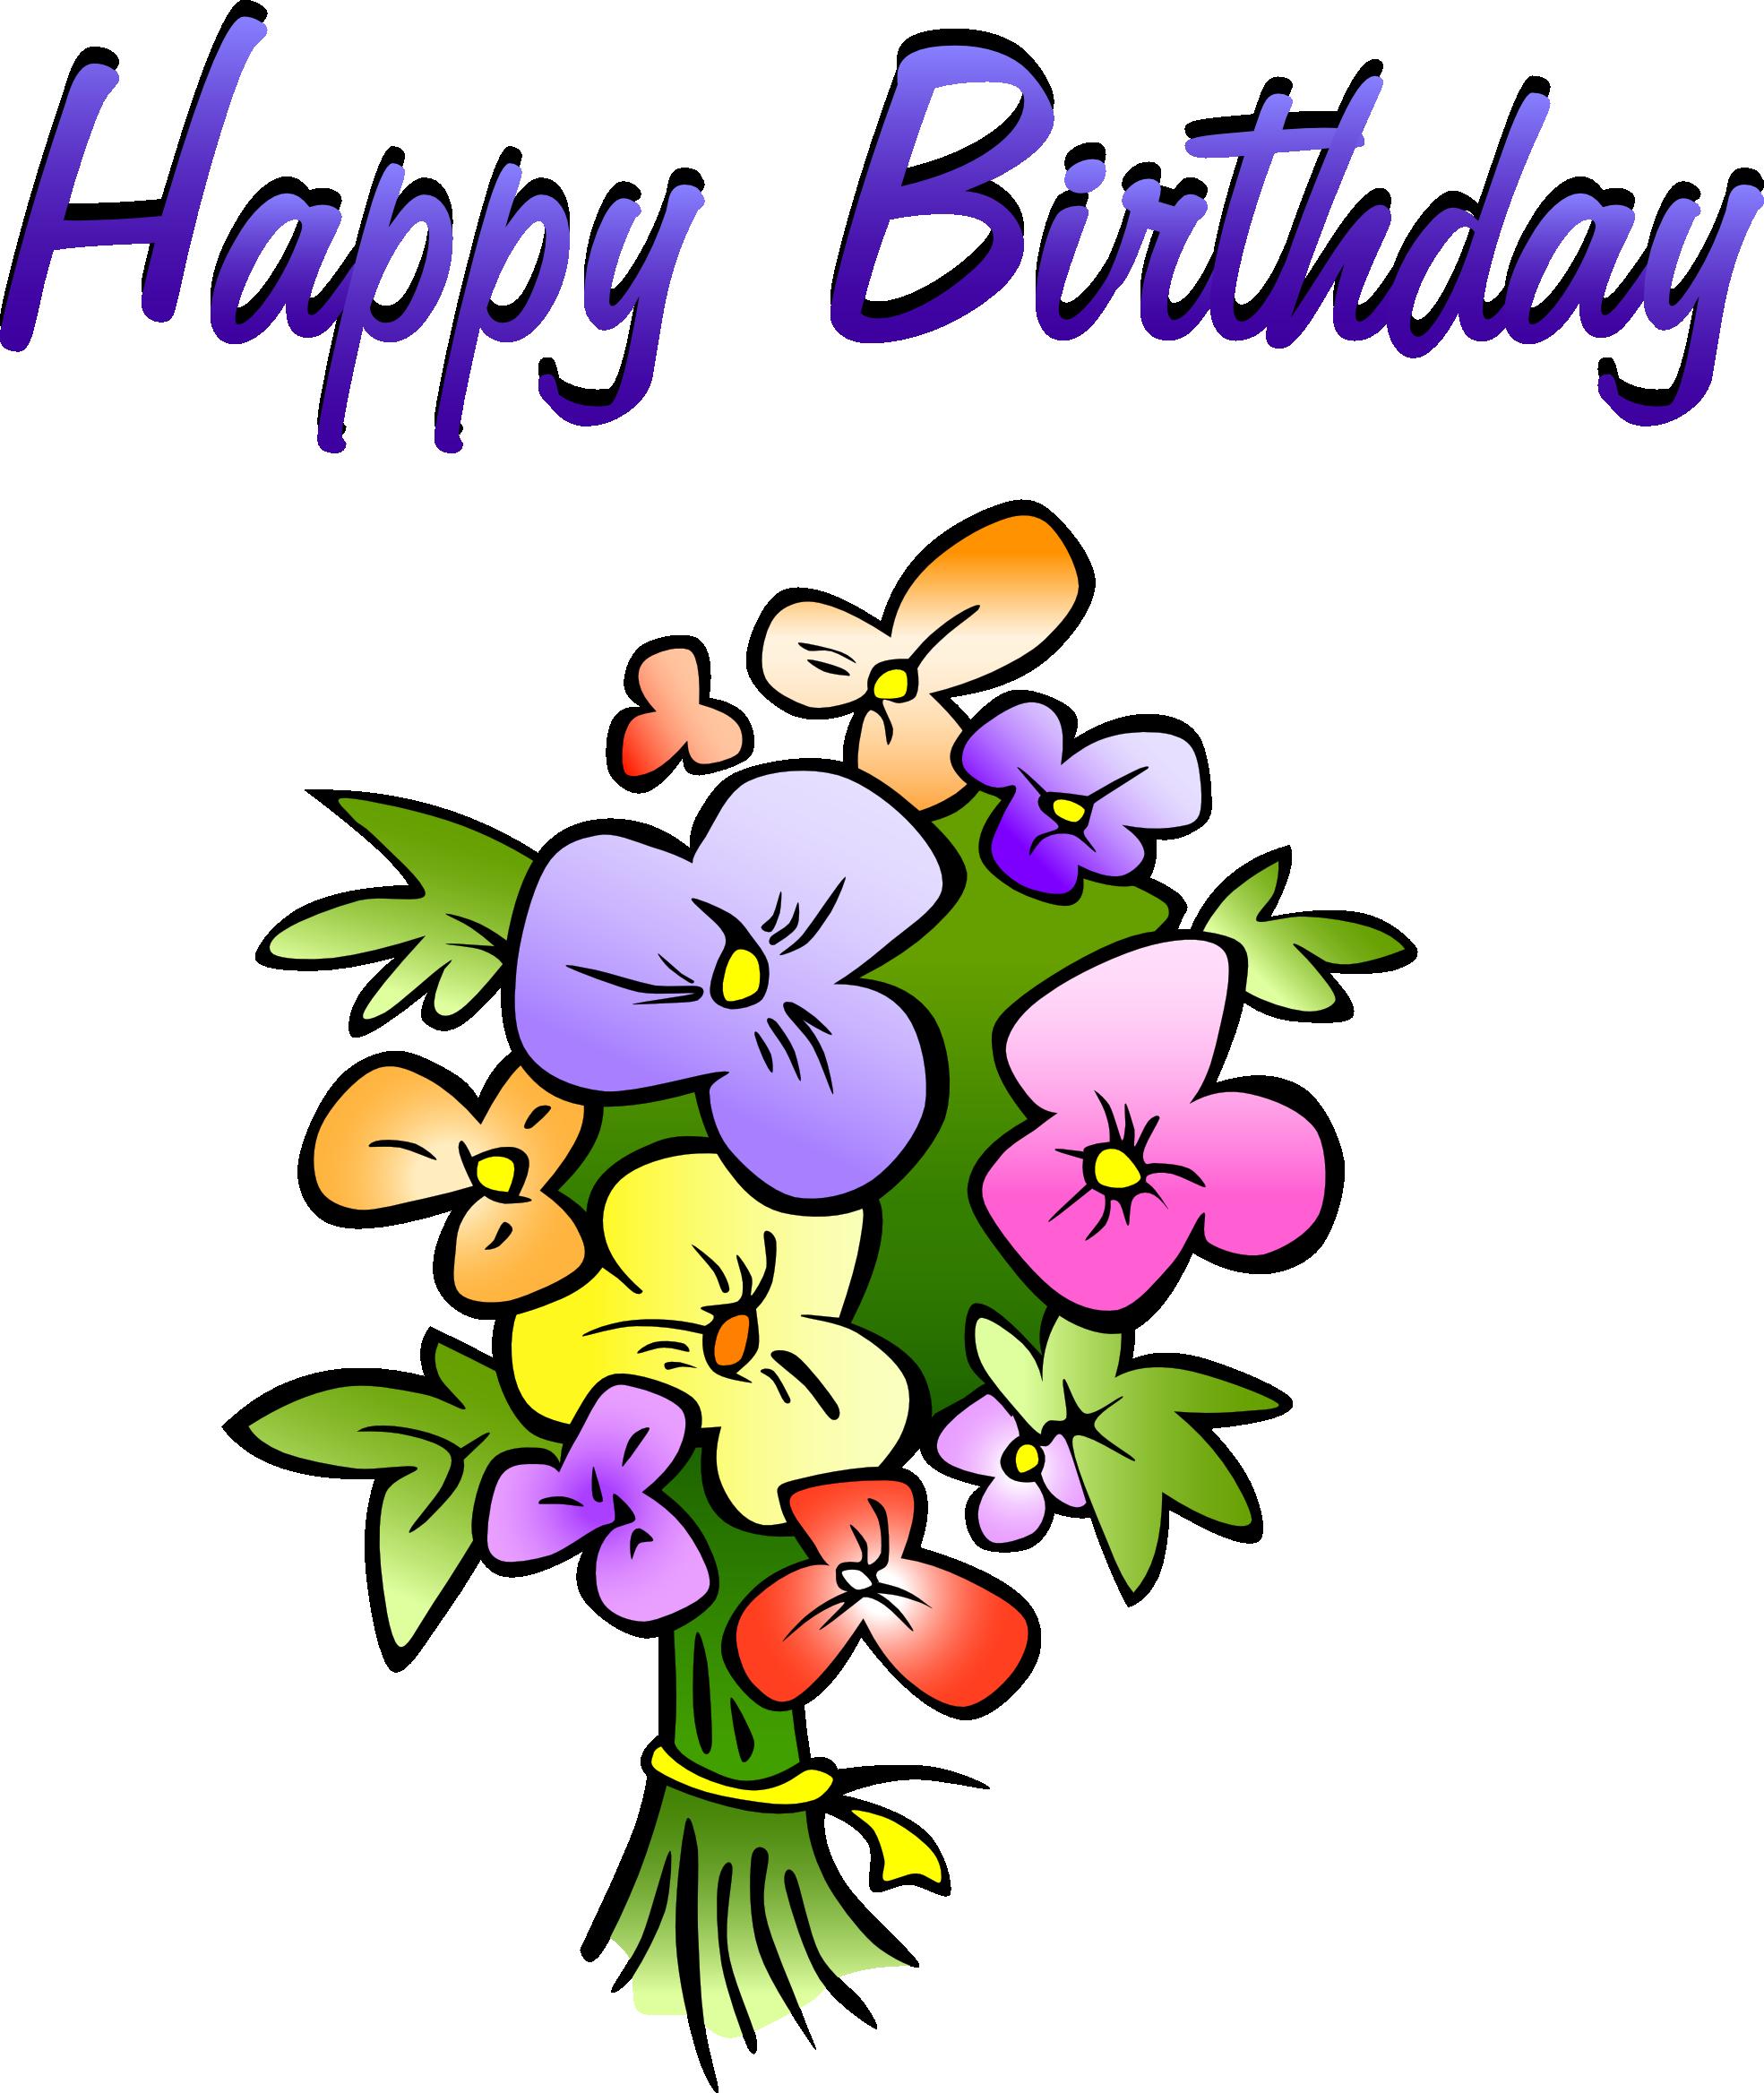 Happy birthday flower clipart vector free library Happy Birthday Flowers Clipart | Clipart Panda - Free Clipart Images vector free library